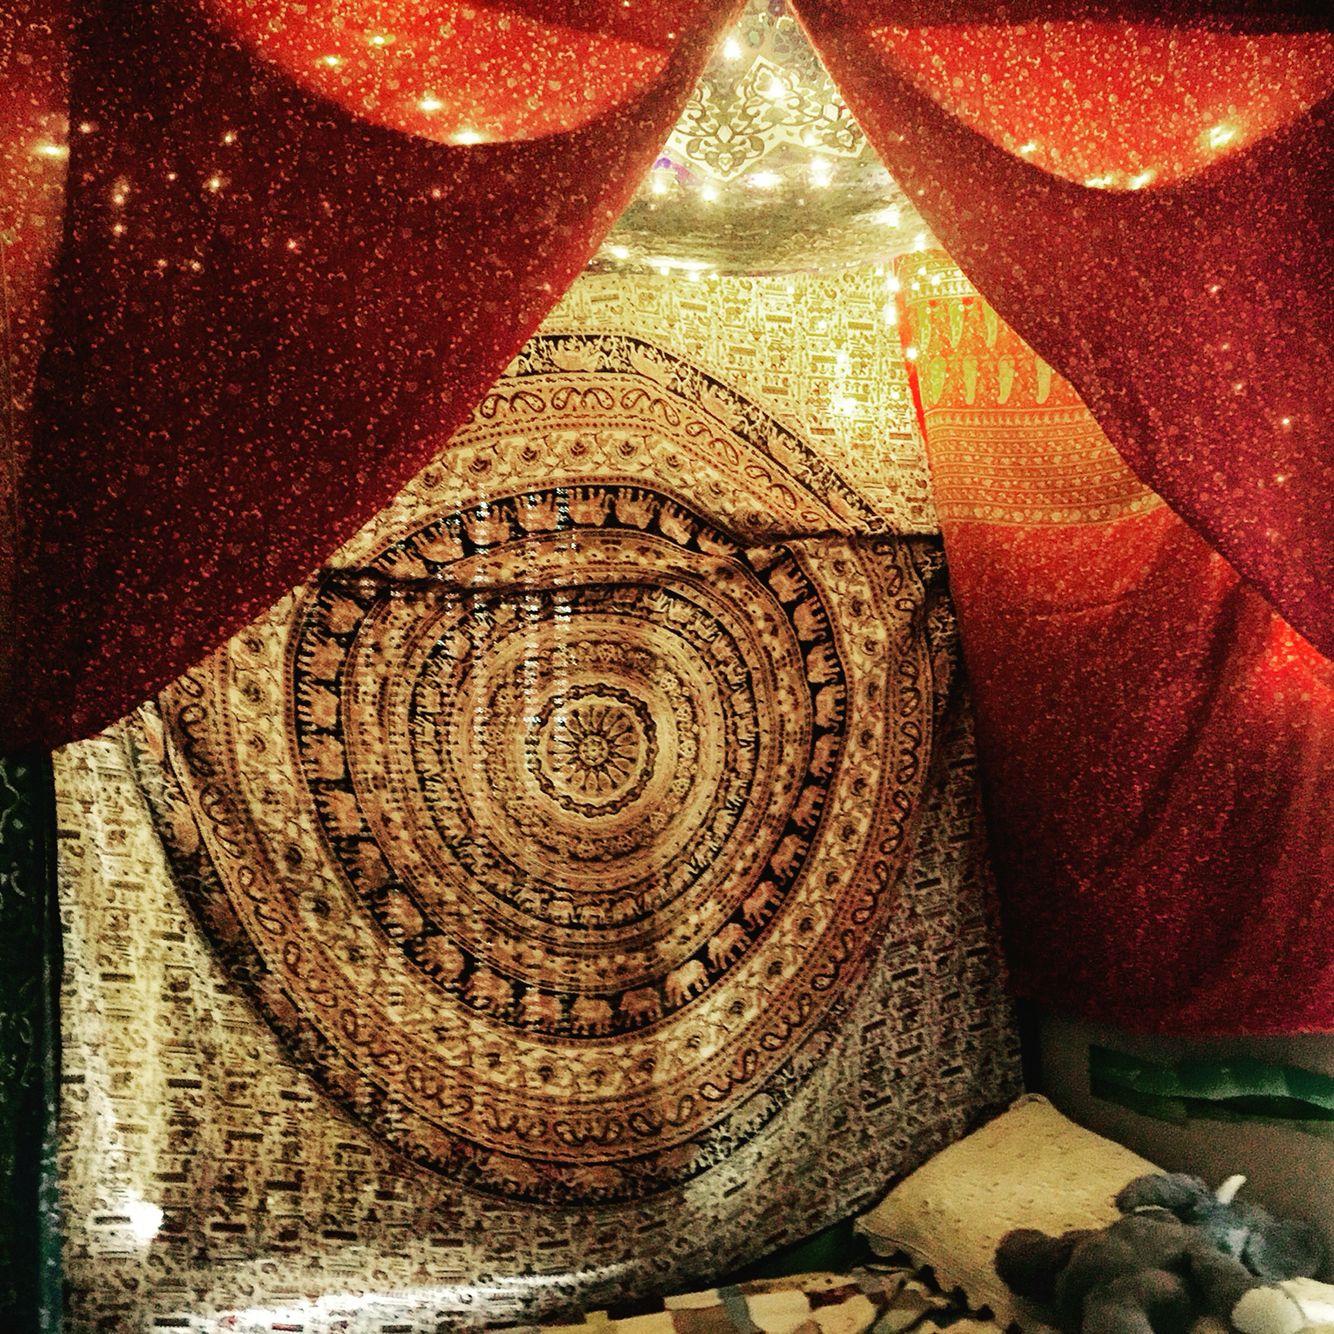 Bed canopy gypsy - Bohemian Tapestry Bedroom Canopy With Fairy Lights Aka Gypsy Cave